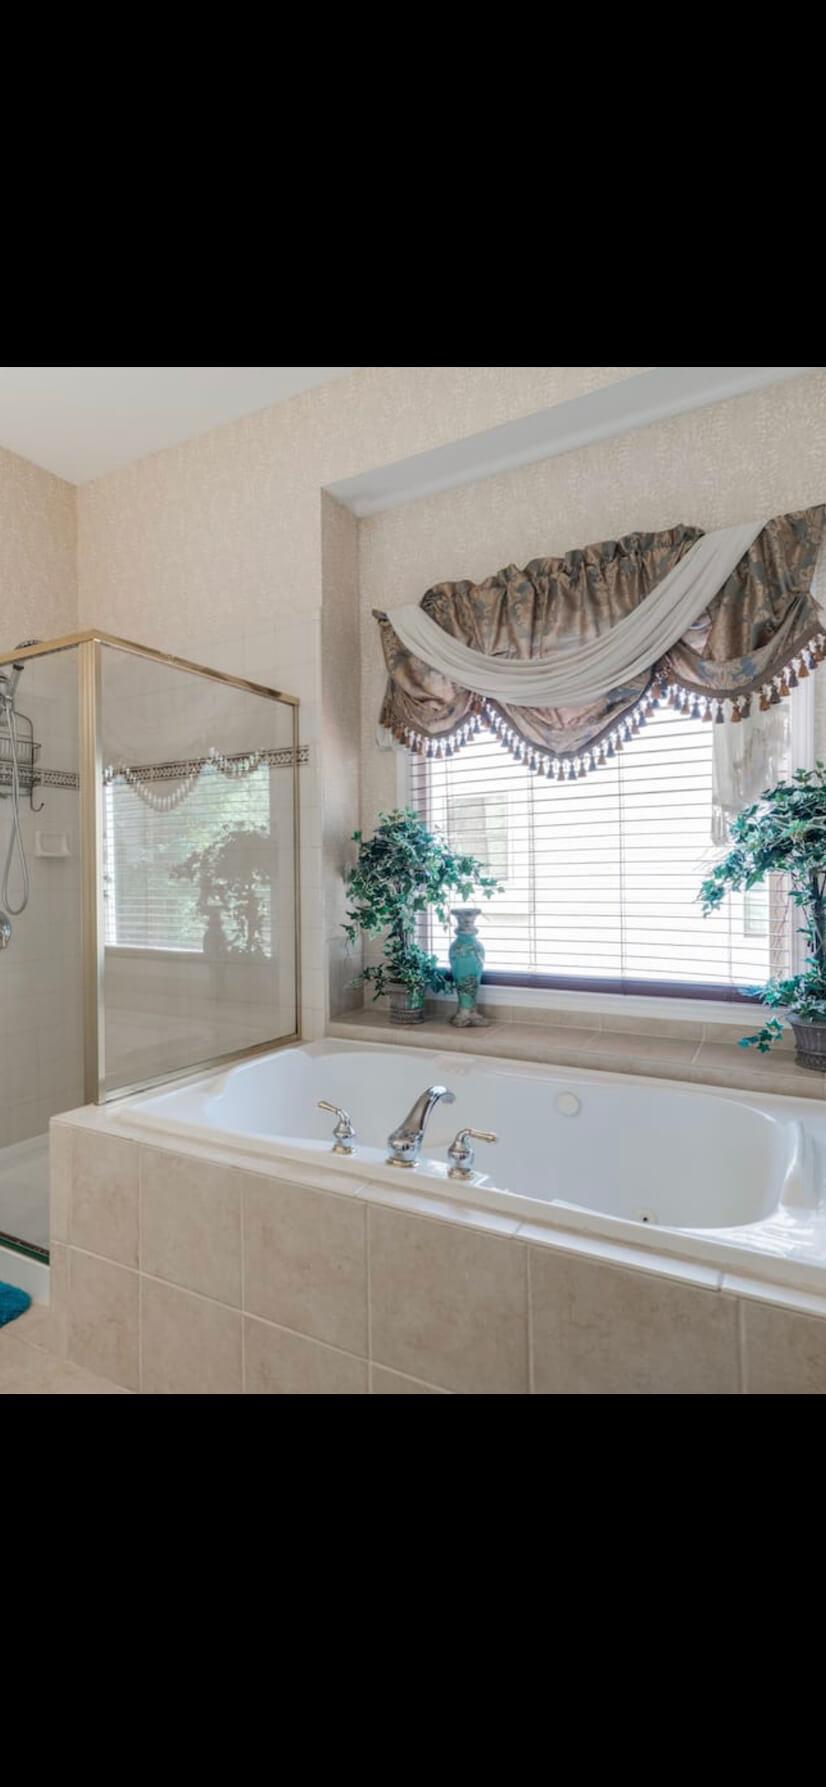 Large Garden Tub in Master bedroom